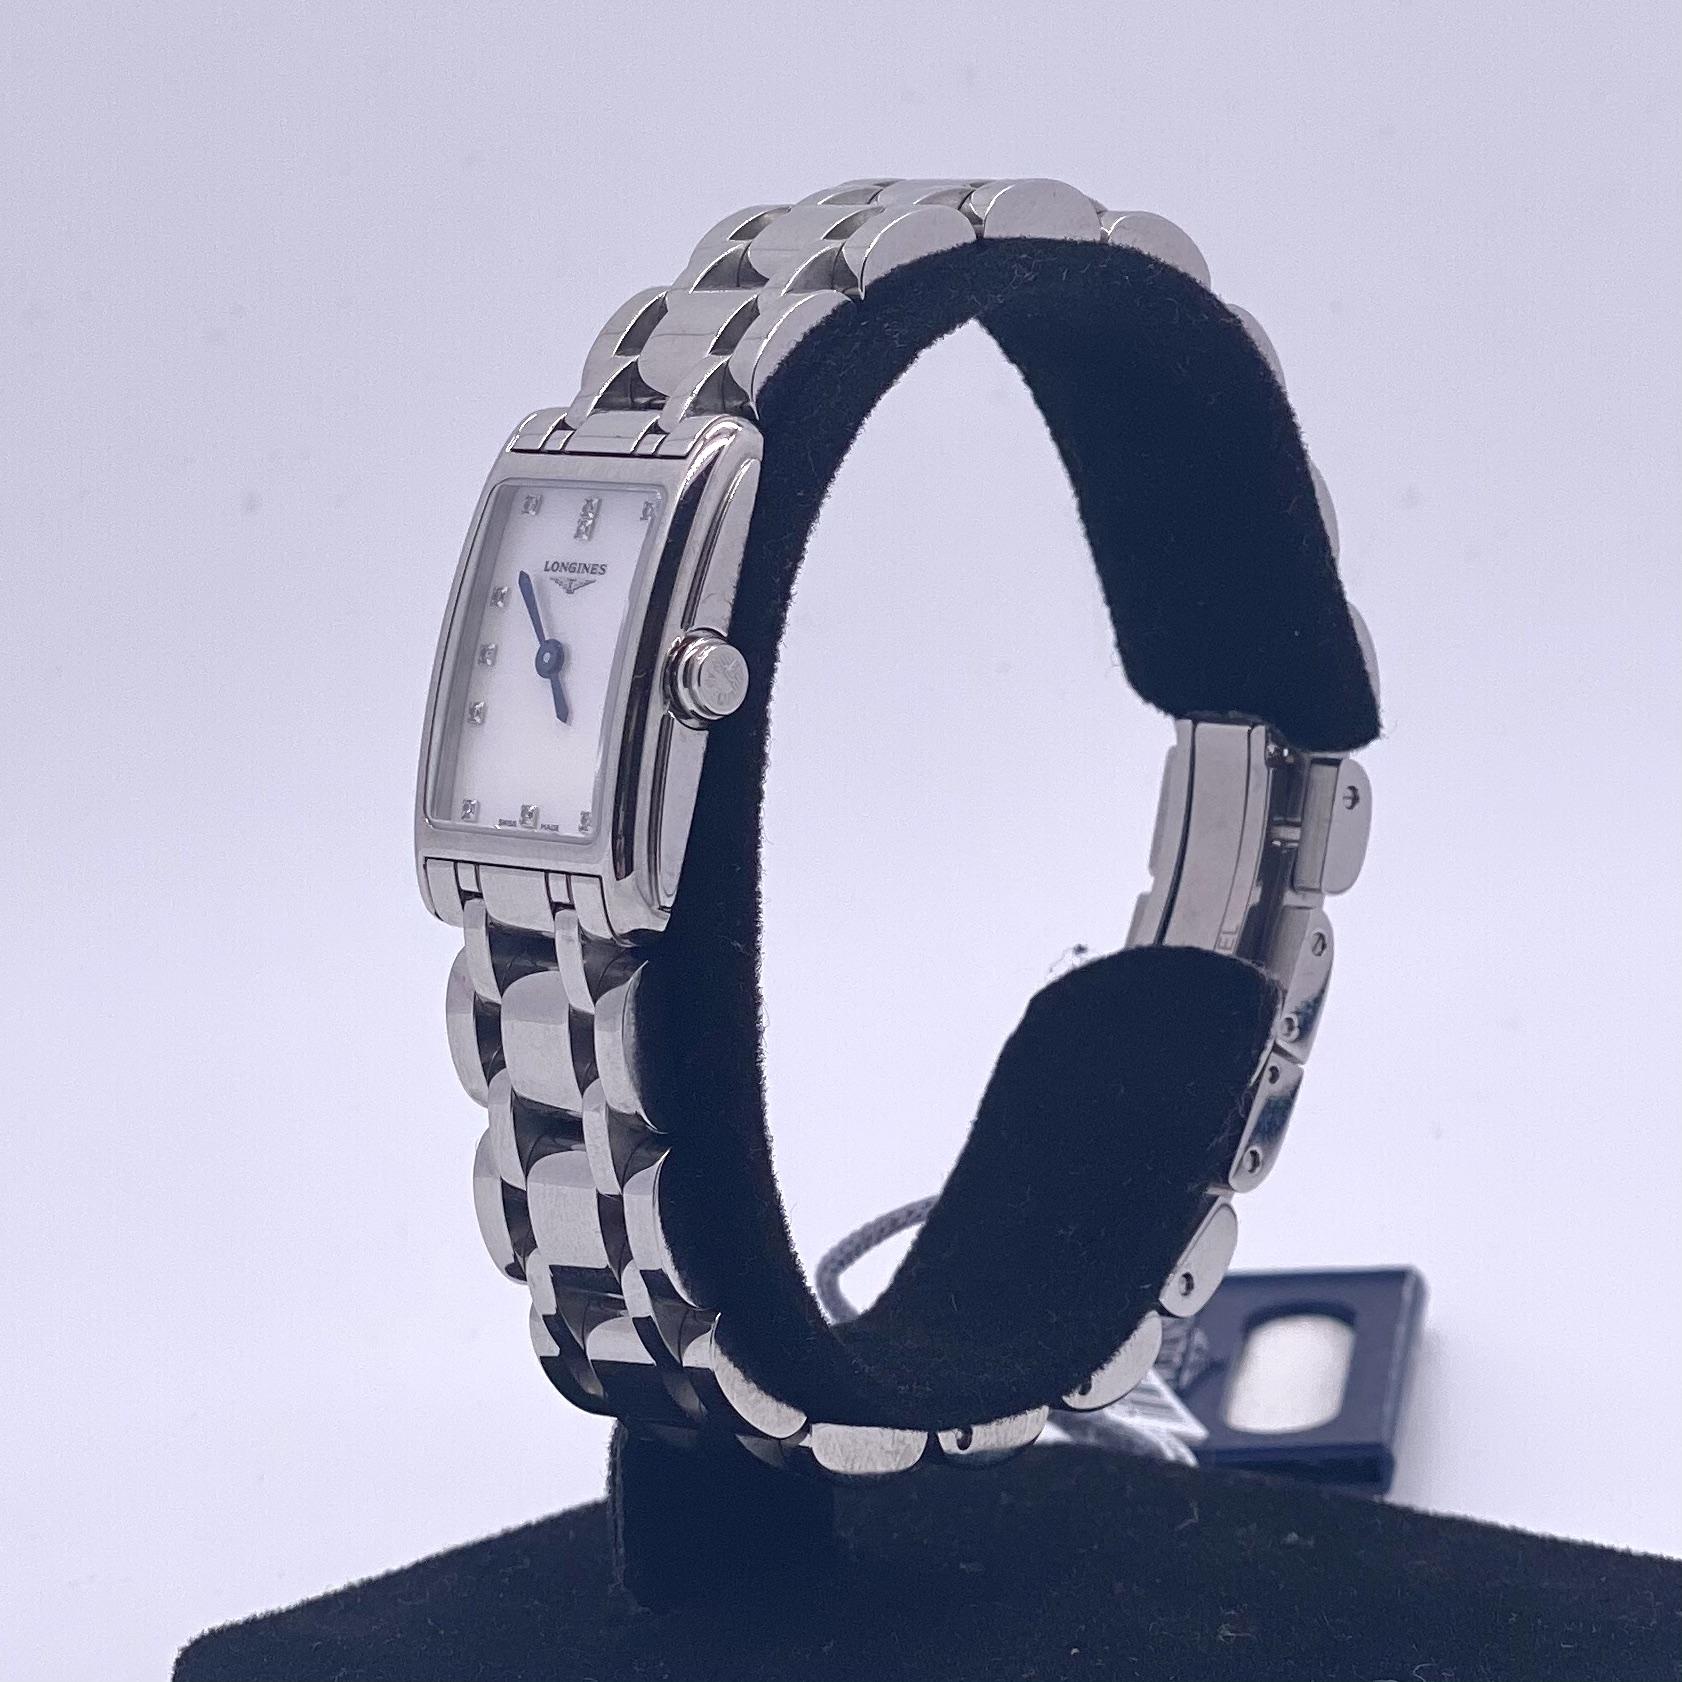 Longines Ladies Dolce Vita Watch L52584876 - Image 2 of 3